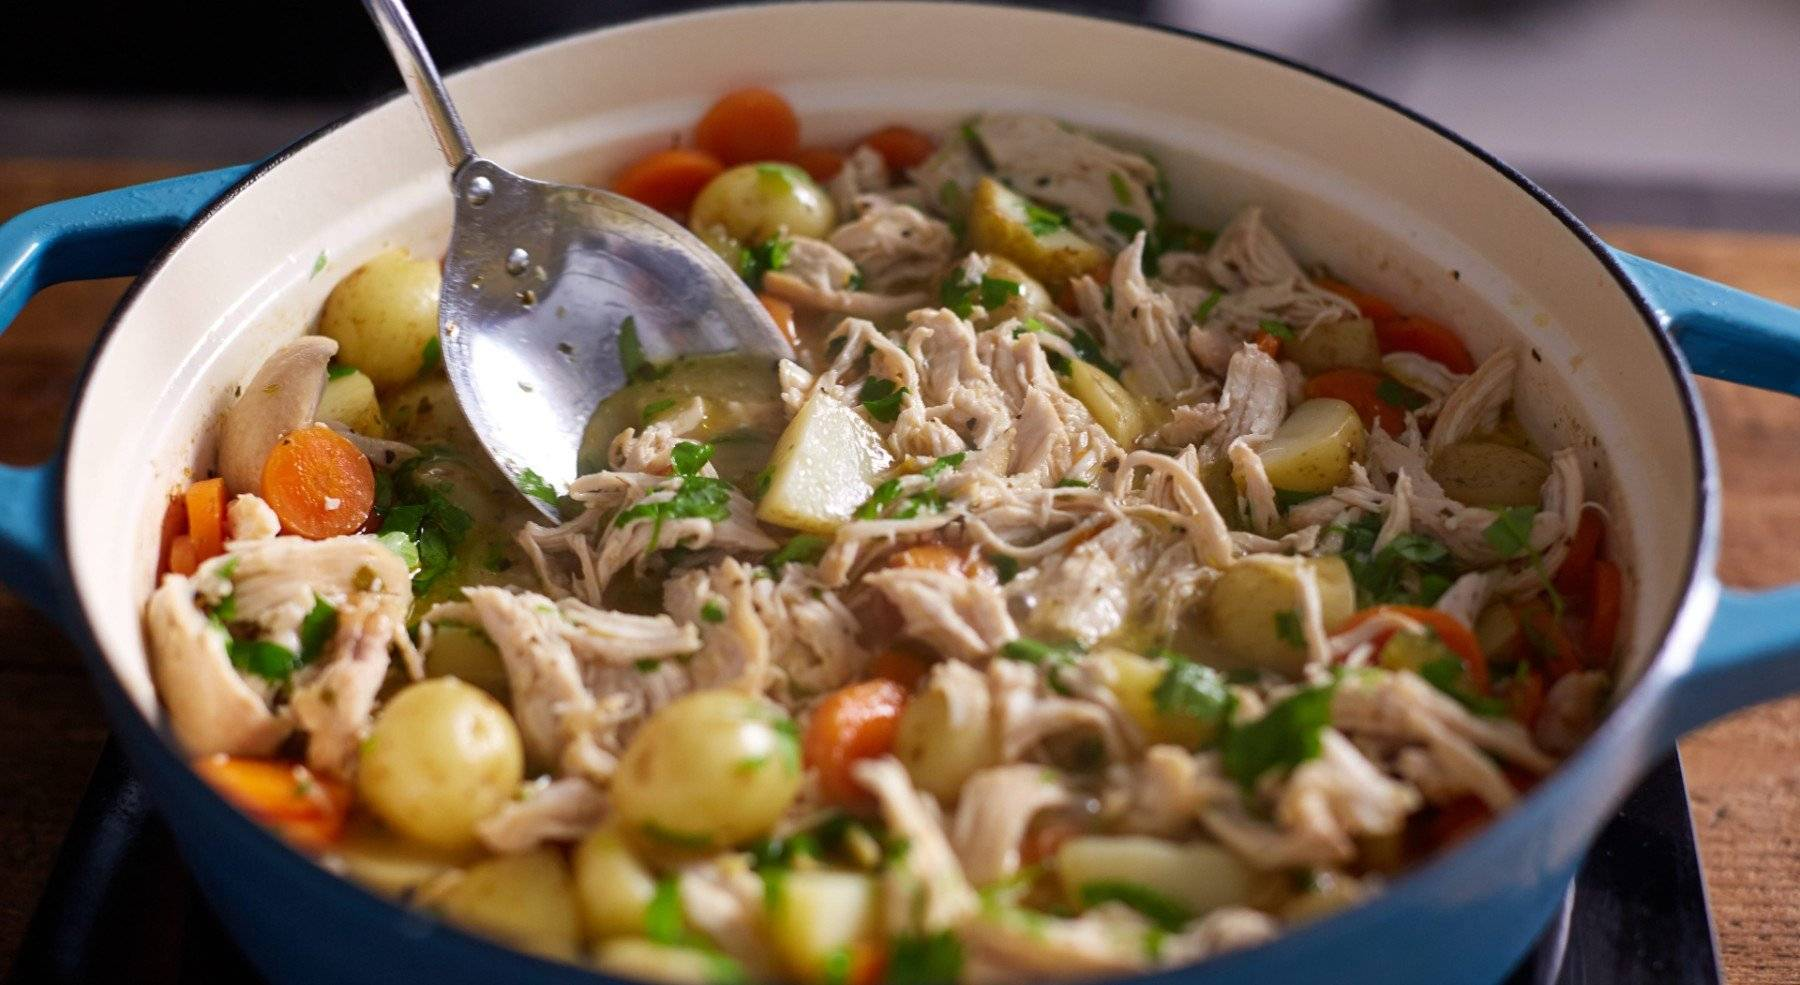 Leckerer Hühnereintopf | Die Meal-Prep zum Aufwärmen